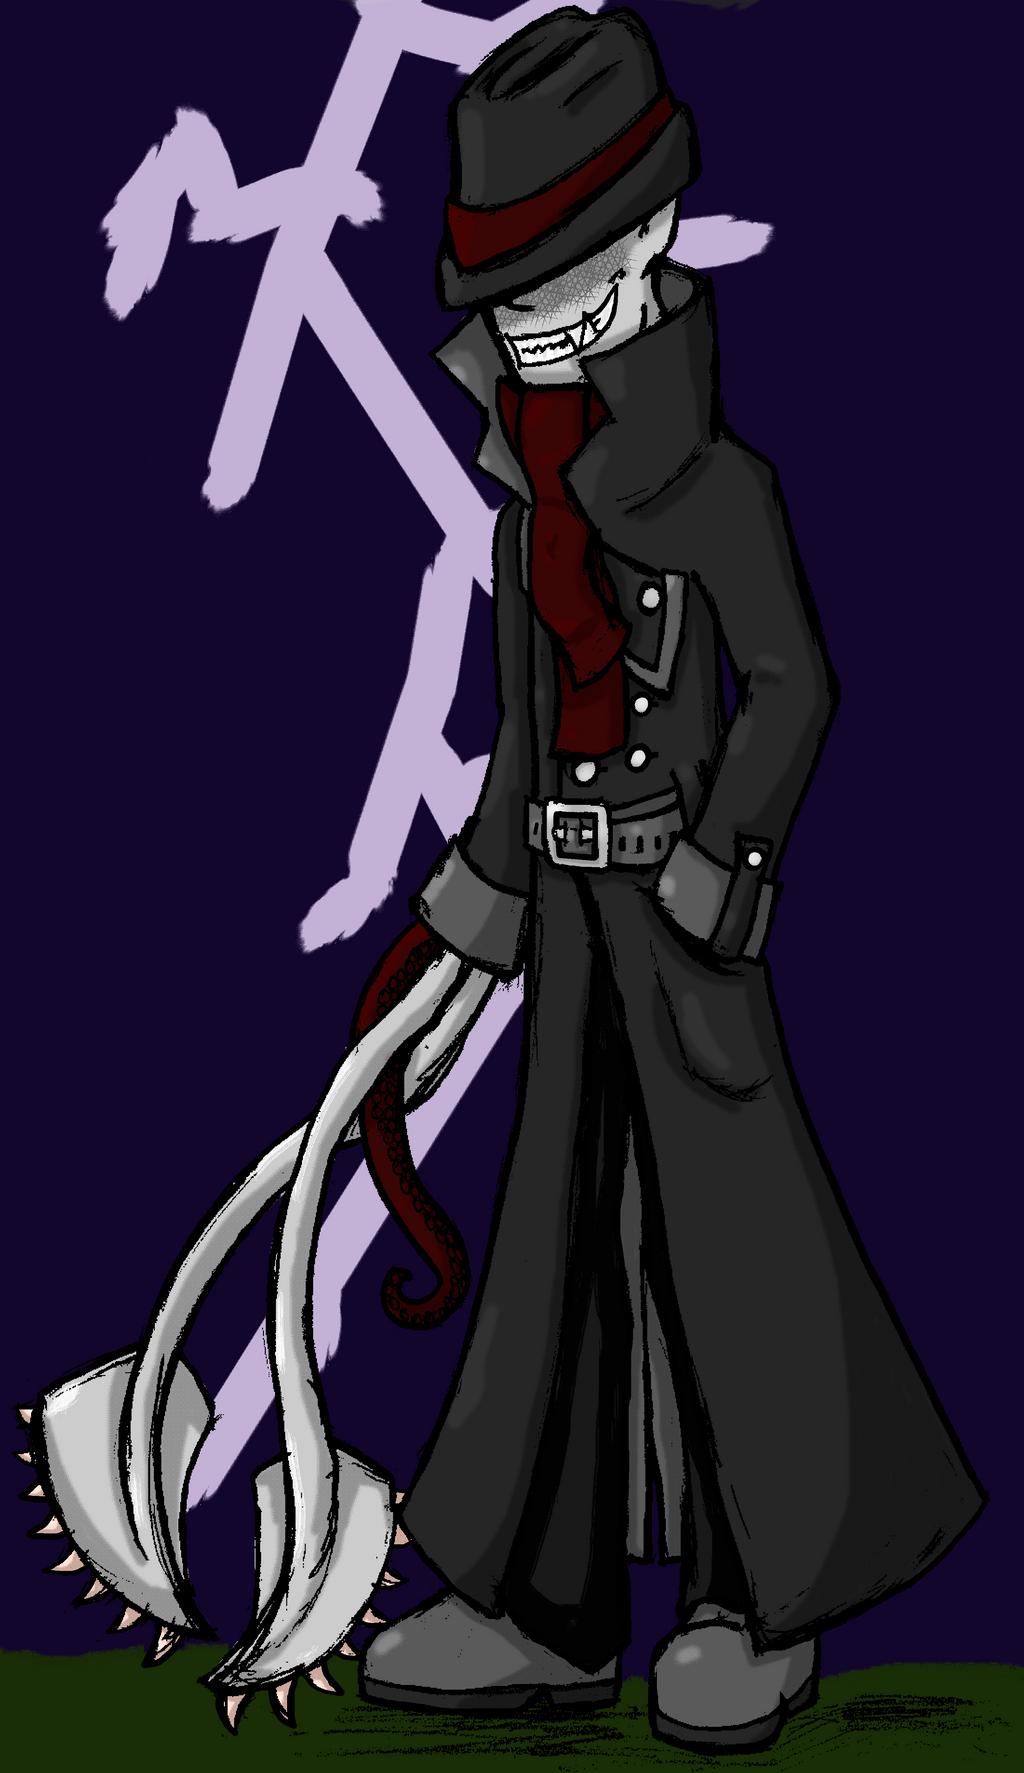 Nyarlathotep - Human Avatar by Tidal-Fox101 on DeviantArt